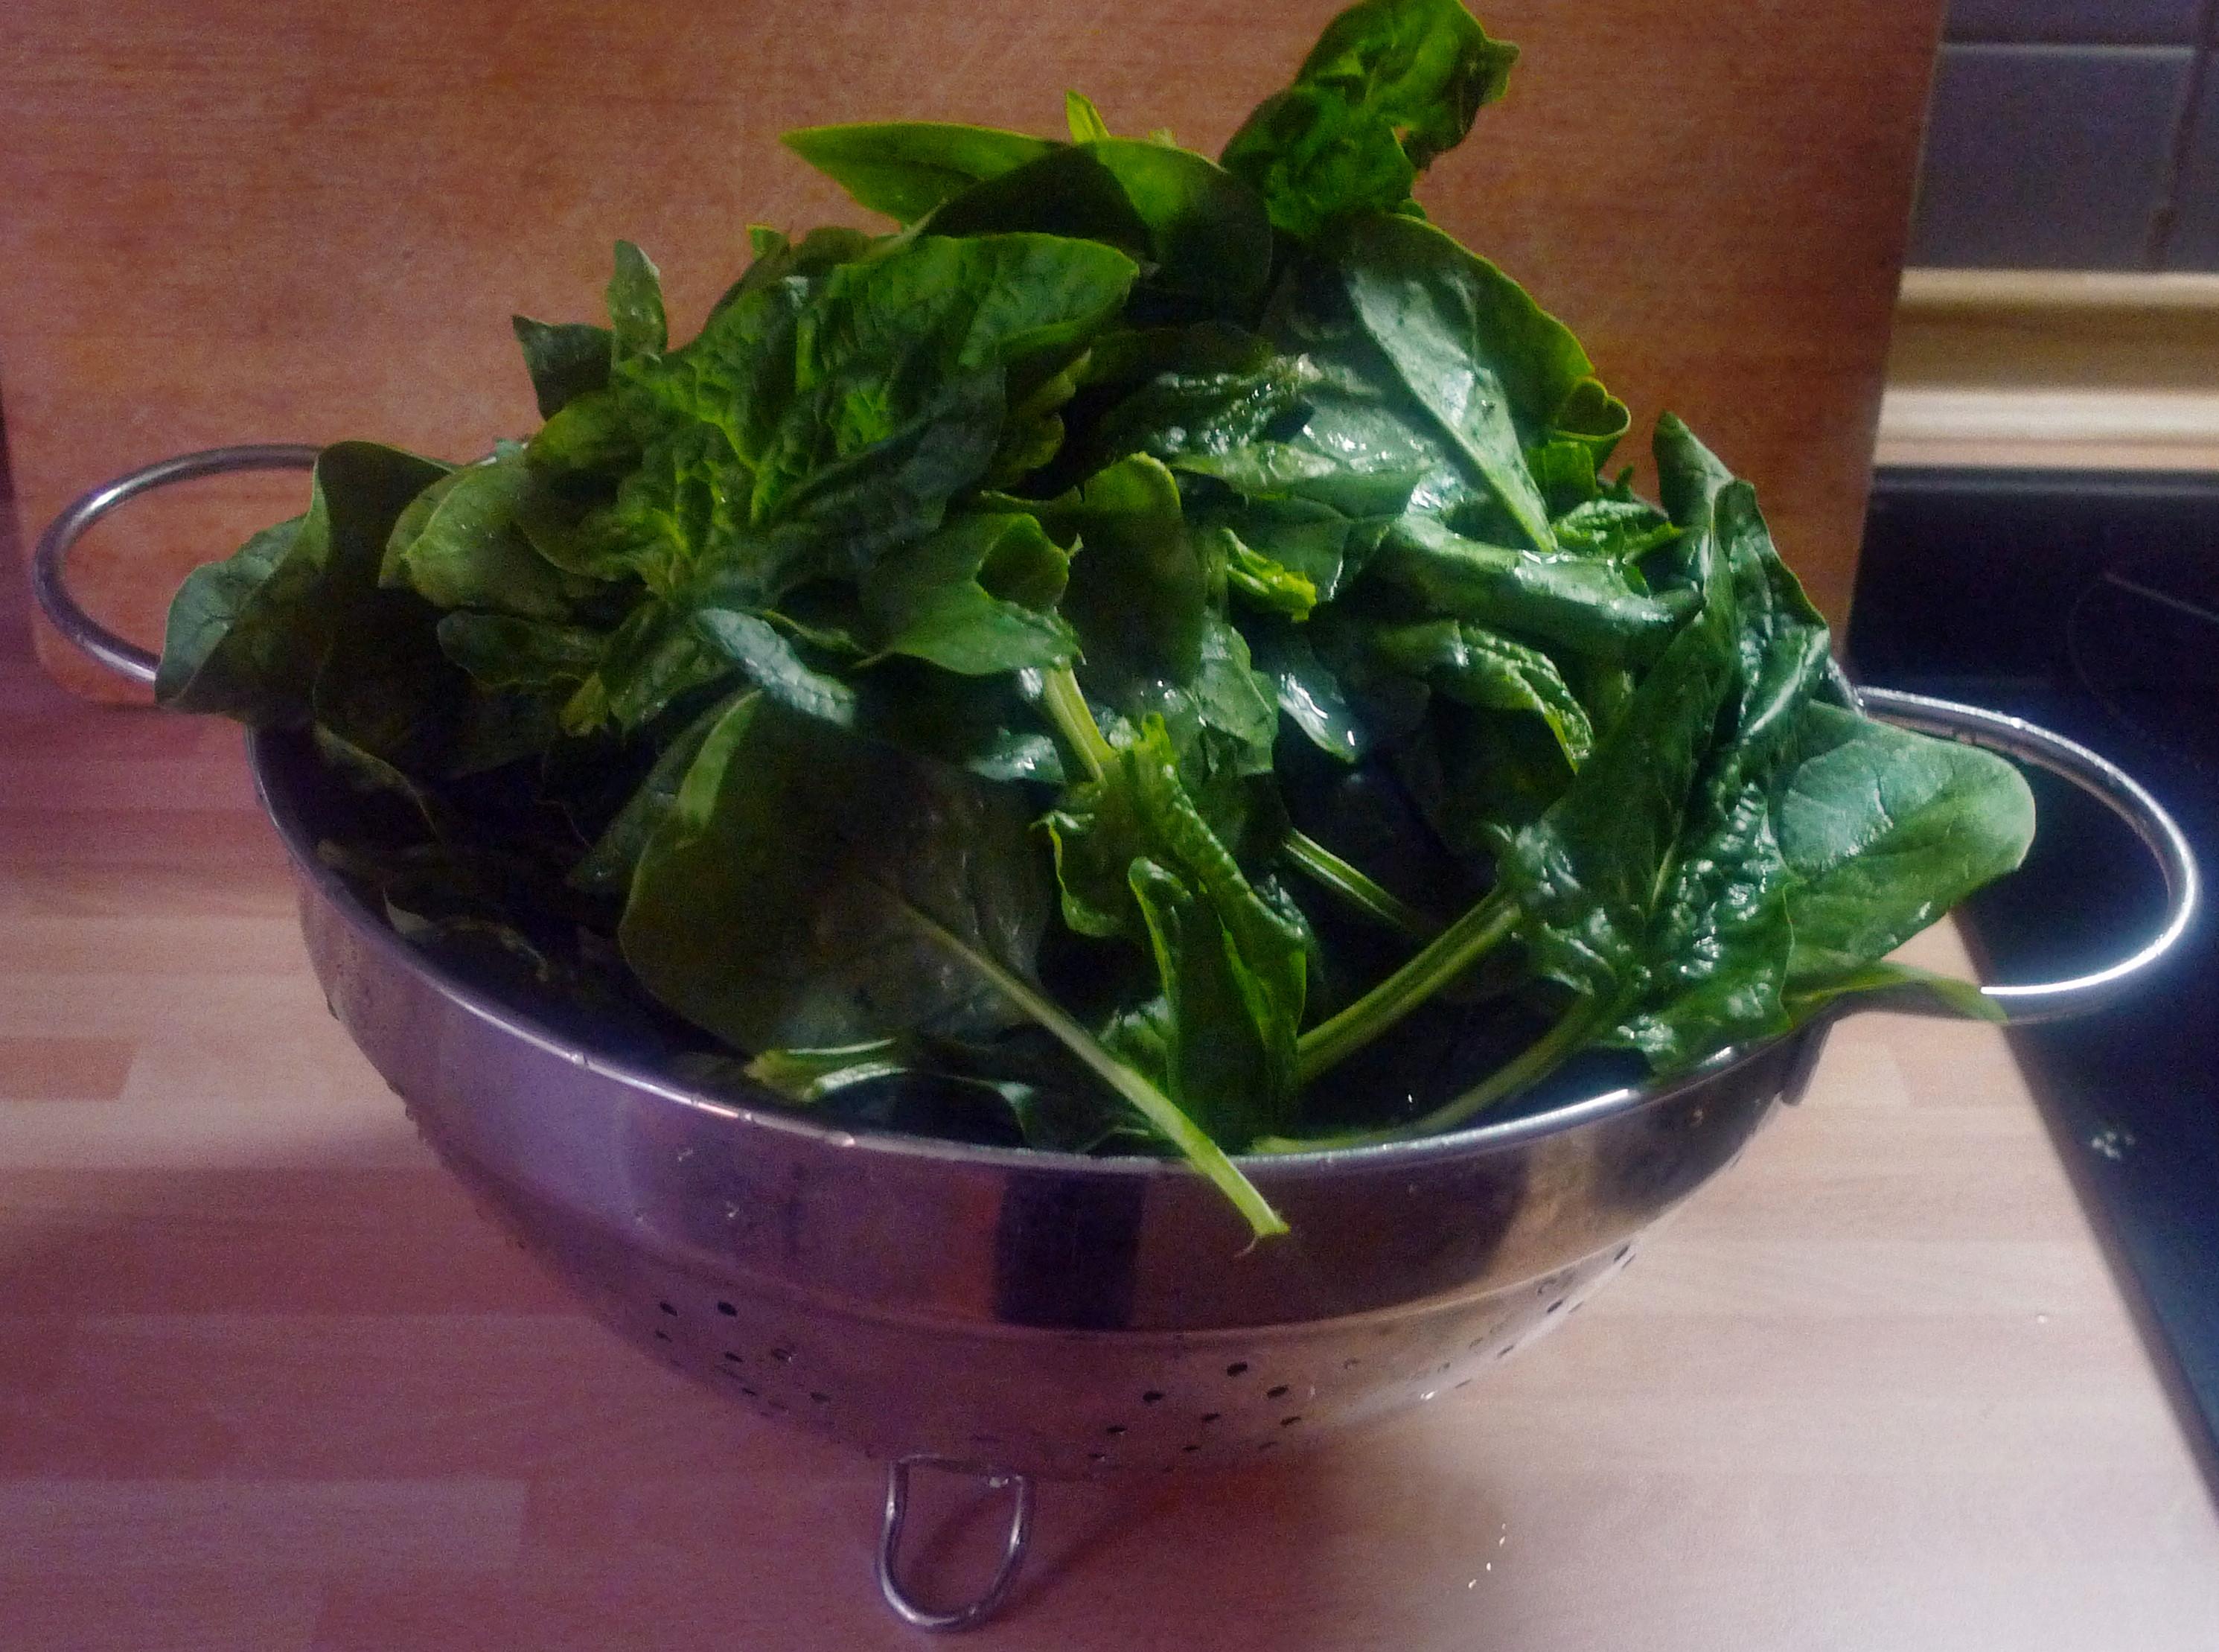 Spinat mit Nudeln-Apfel im Schlafrock -25.10.14   (2a) (2)